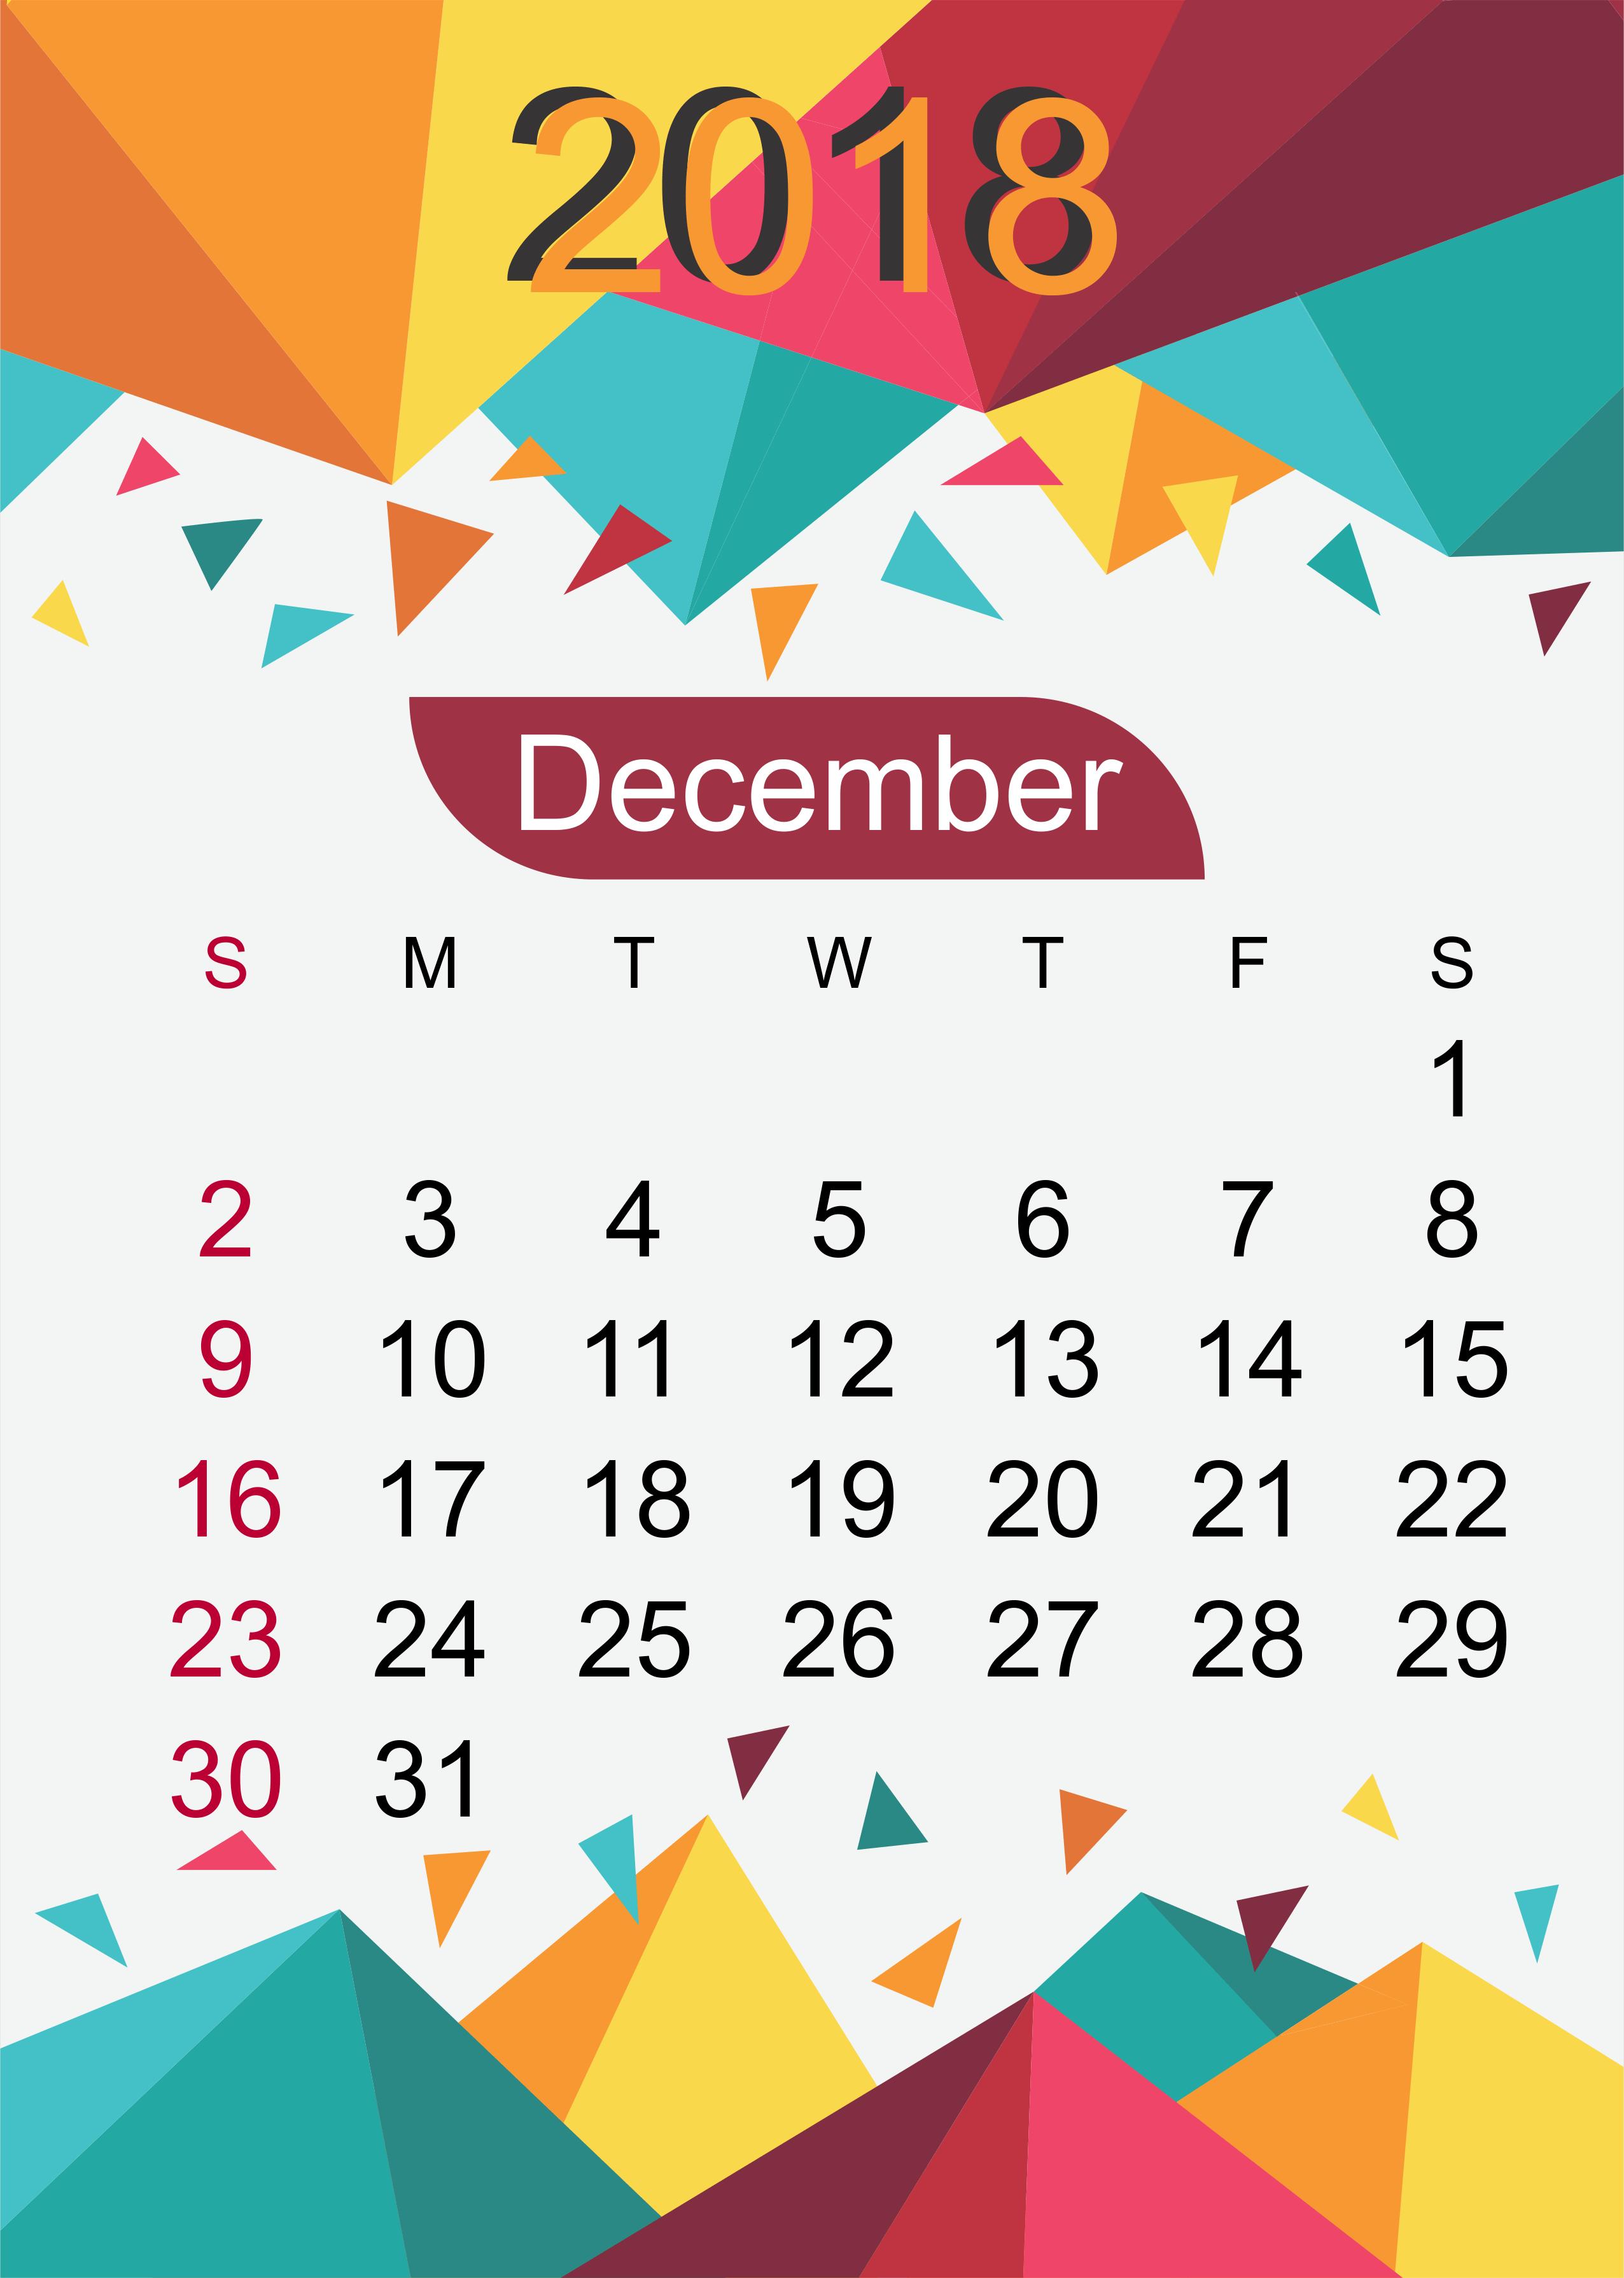 December 2018 Calendar Wallpapers Wallpaper Cave